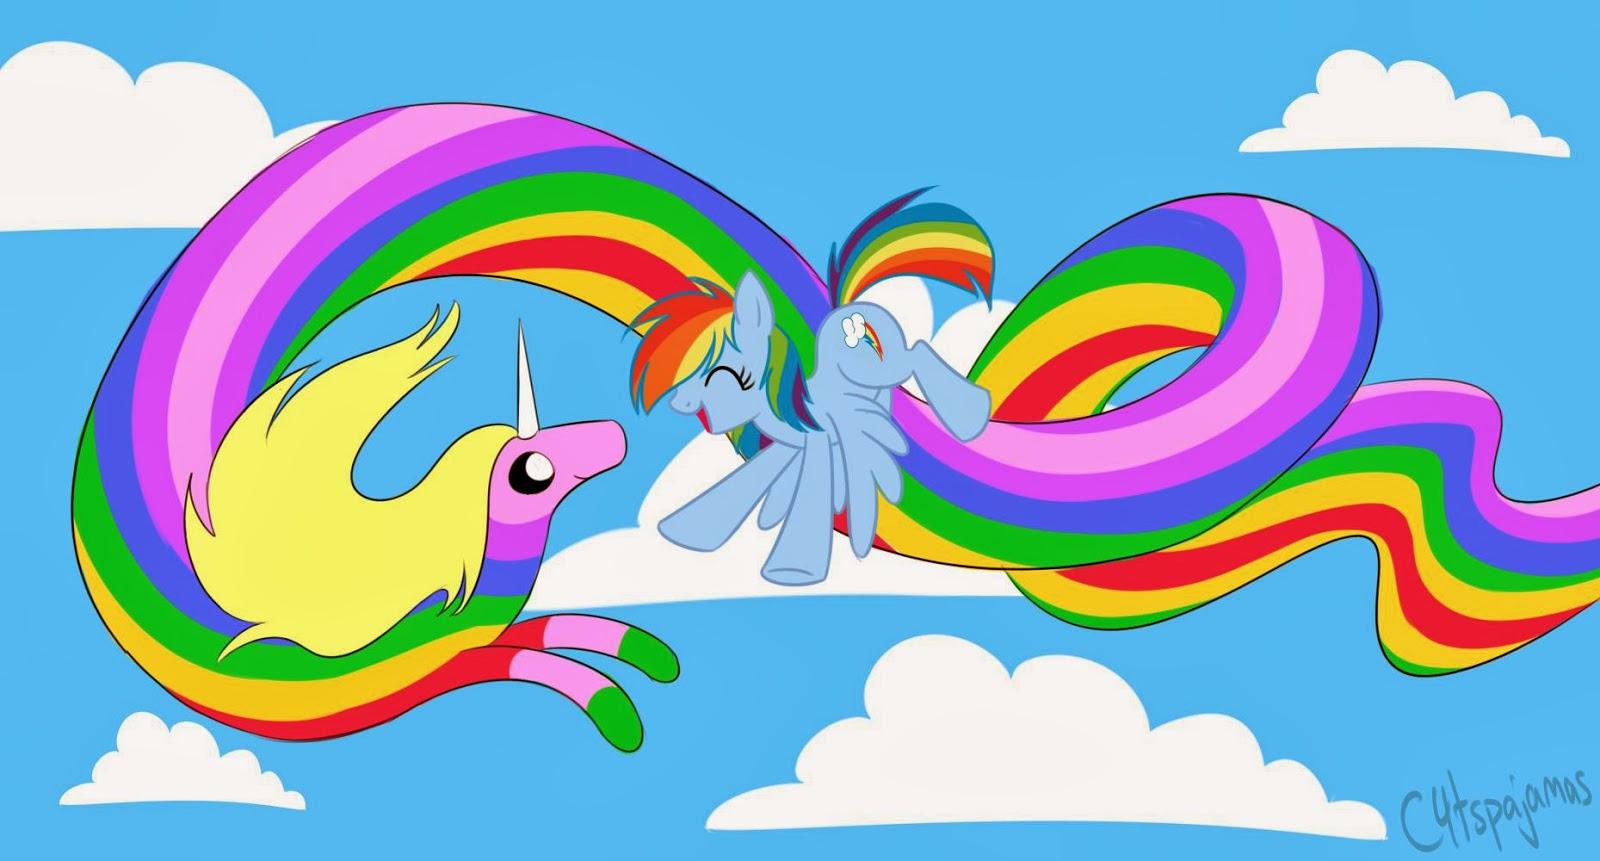 Cute Chibi Fox Wallpaper Free Hd Wallpaper Download Adventure Time Wallpaper Hd